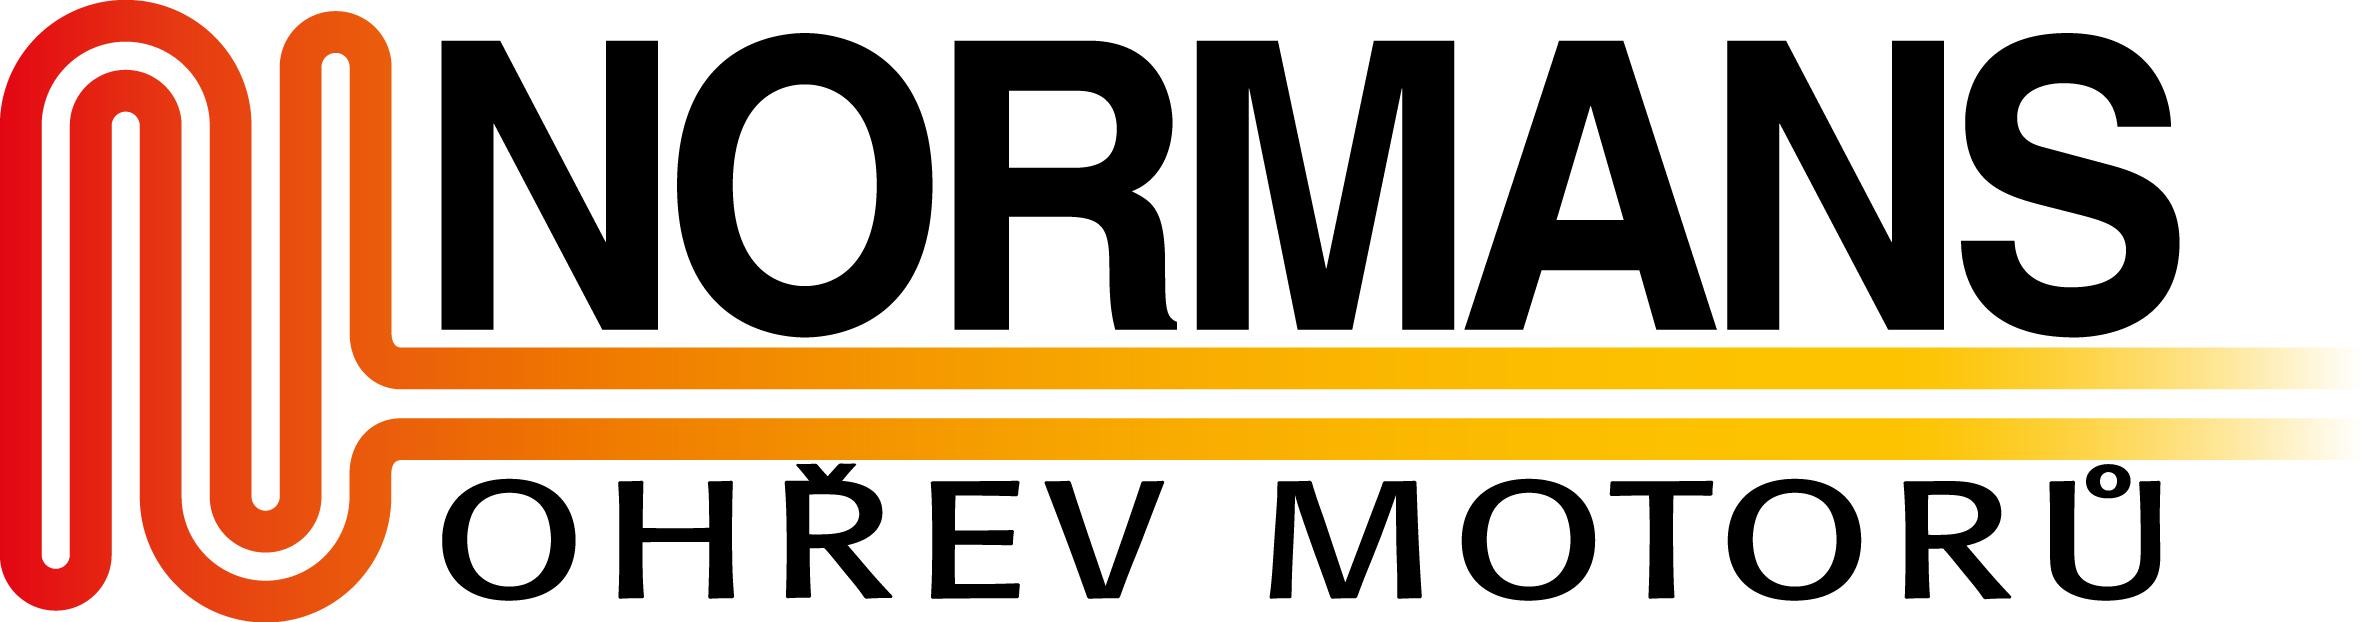 logo firmy Normans - ohøev motorù, s.r.o.